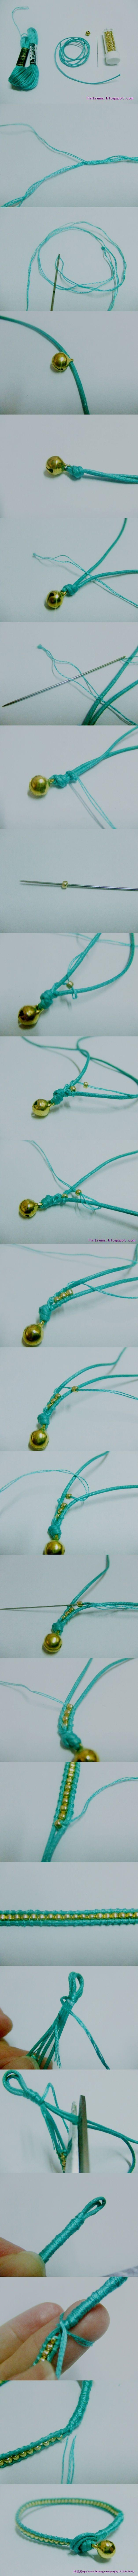 Bracelet how to